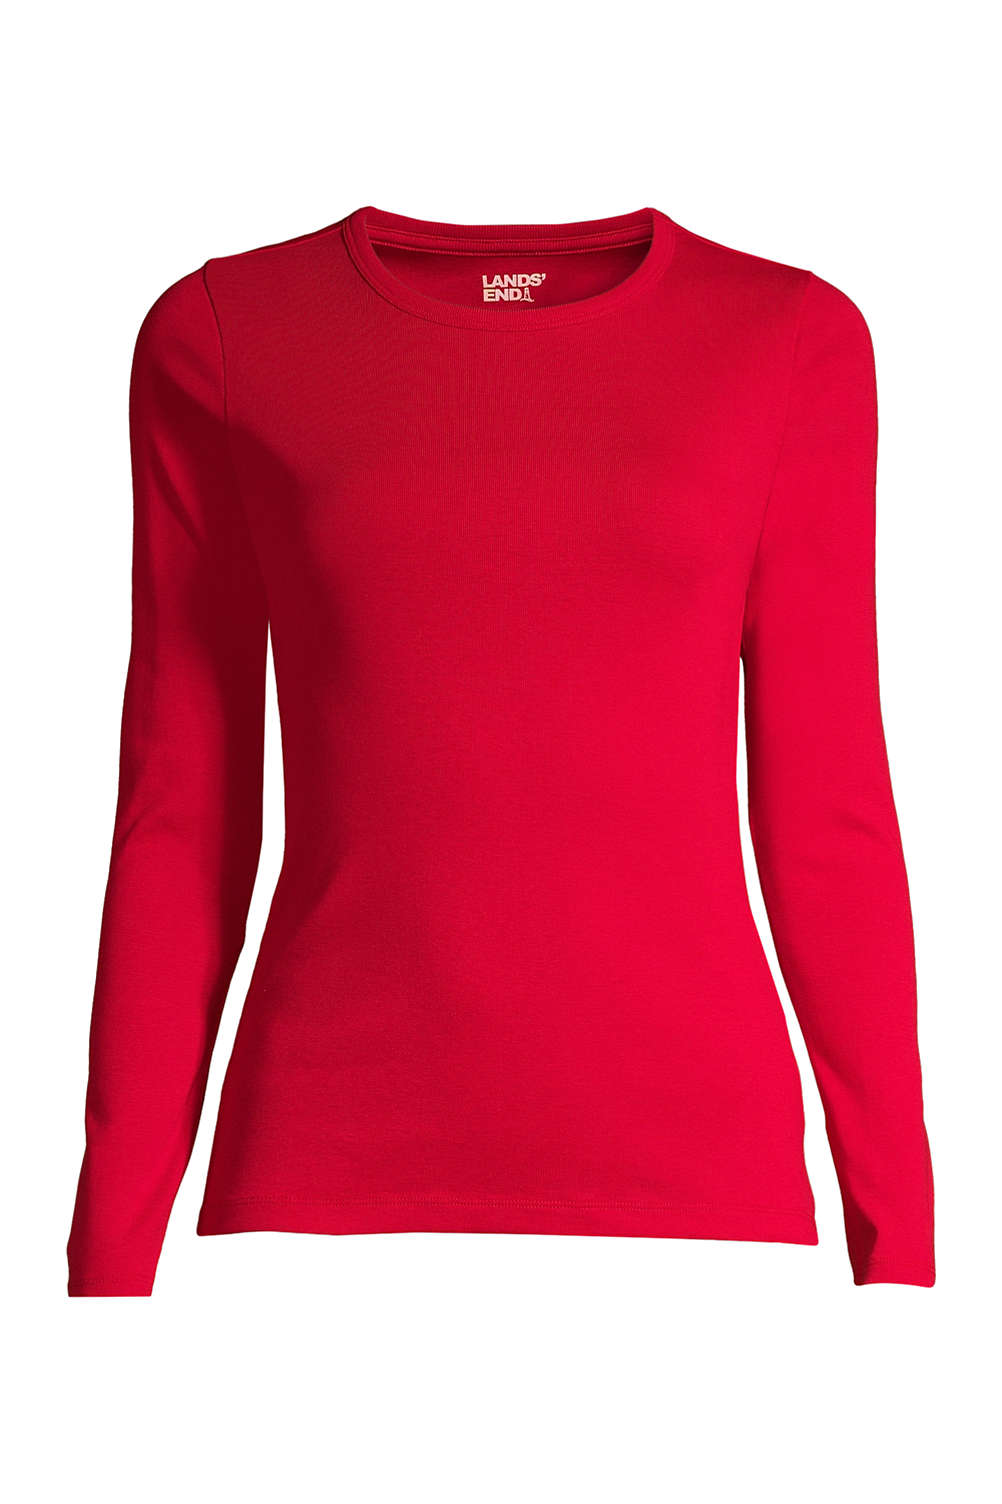 28c82c7d Women's Plus Size All Cotton Long Sleeve T-Shirt - Rib Knit Crewneck